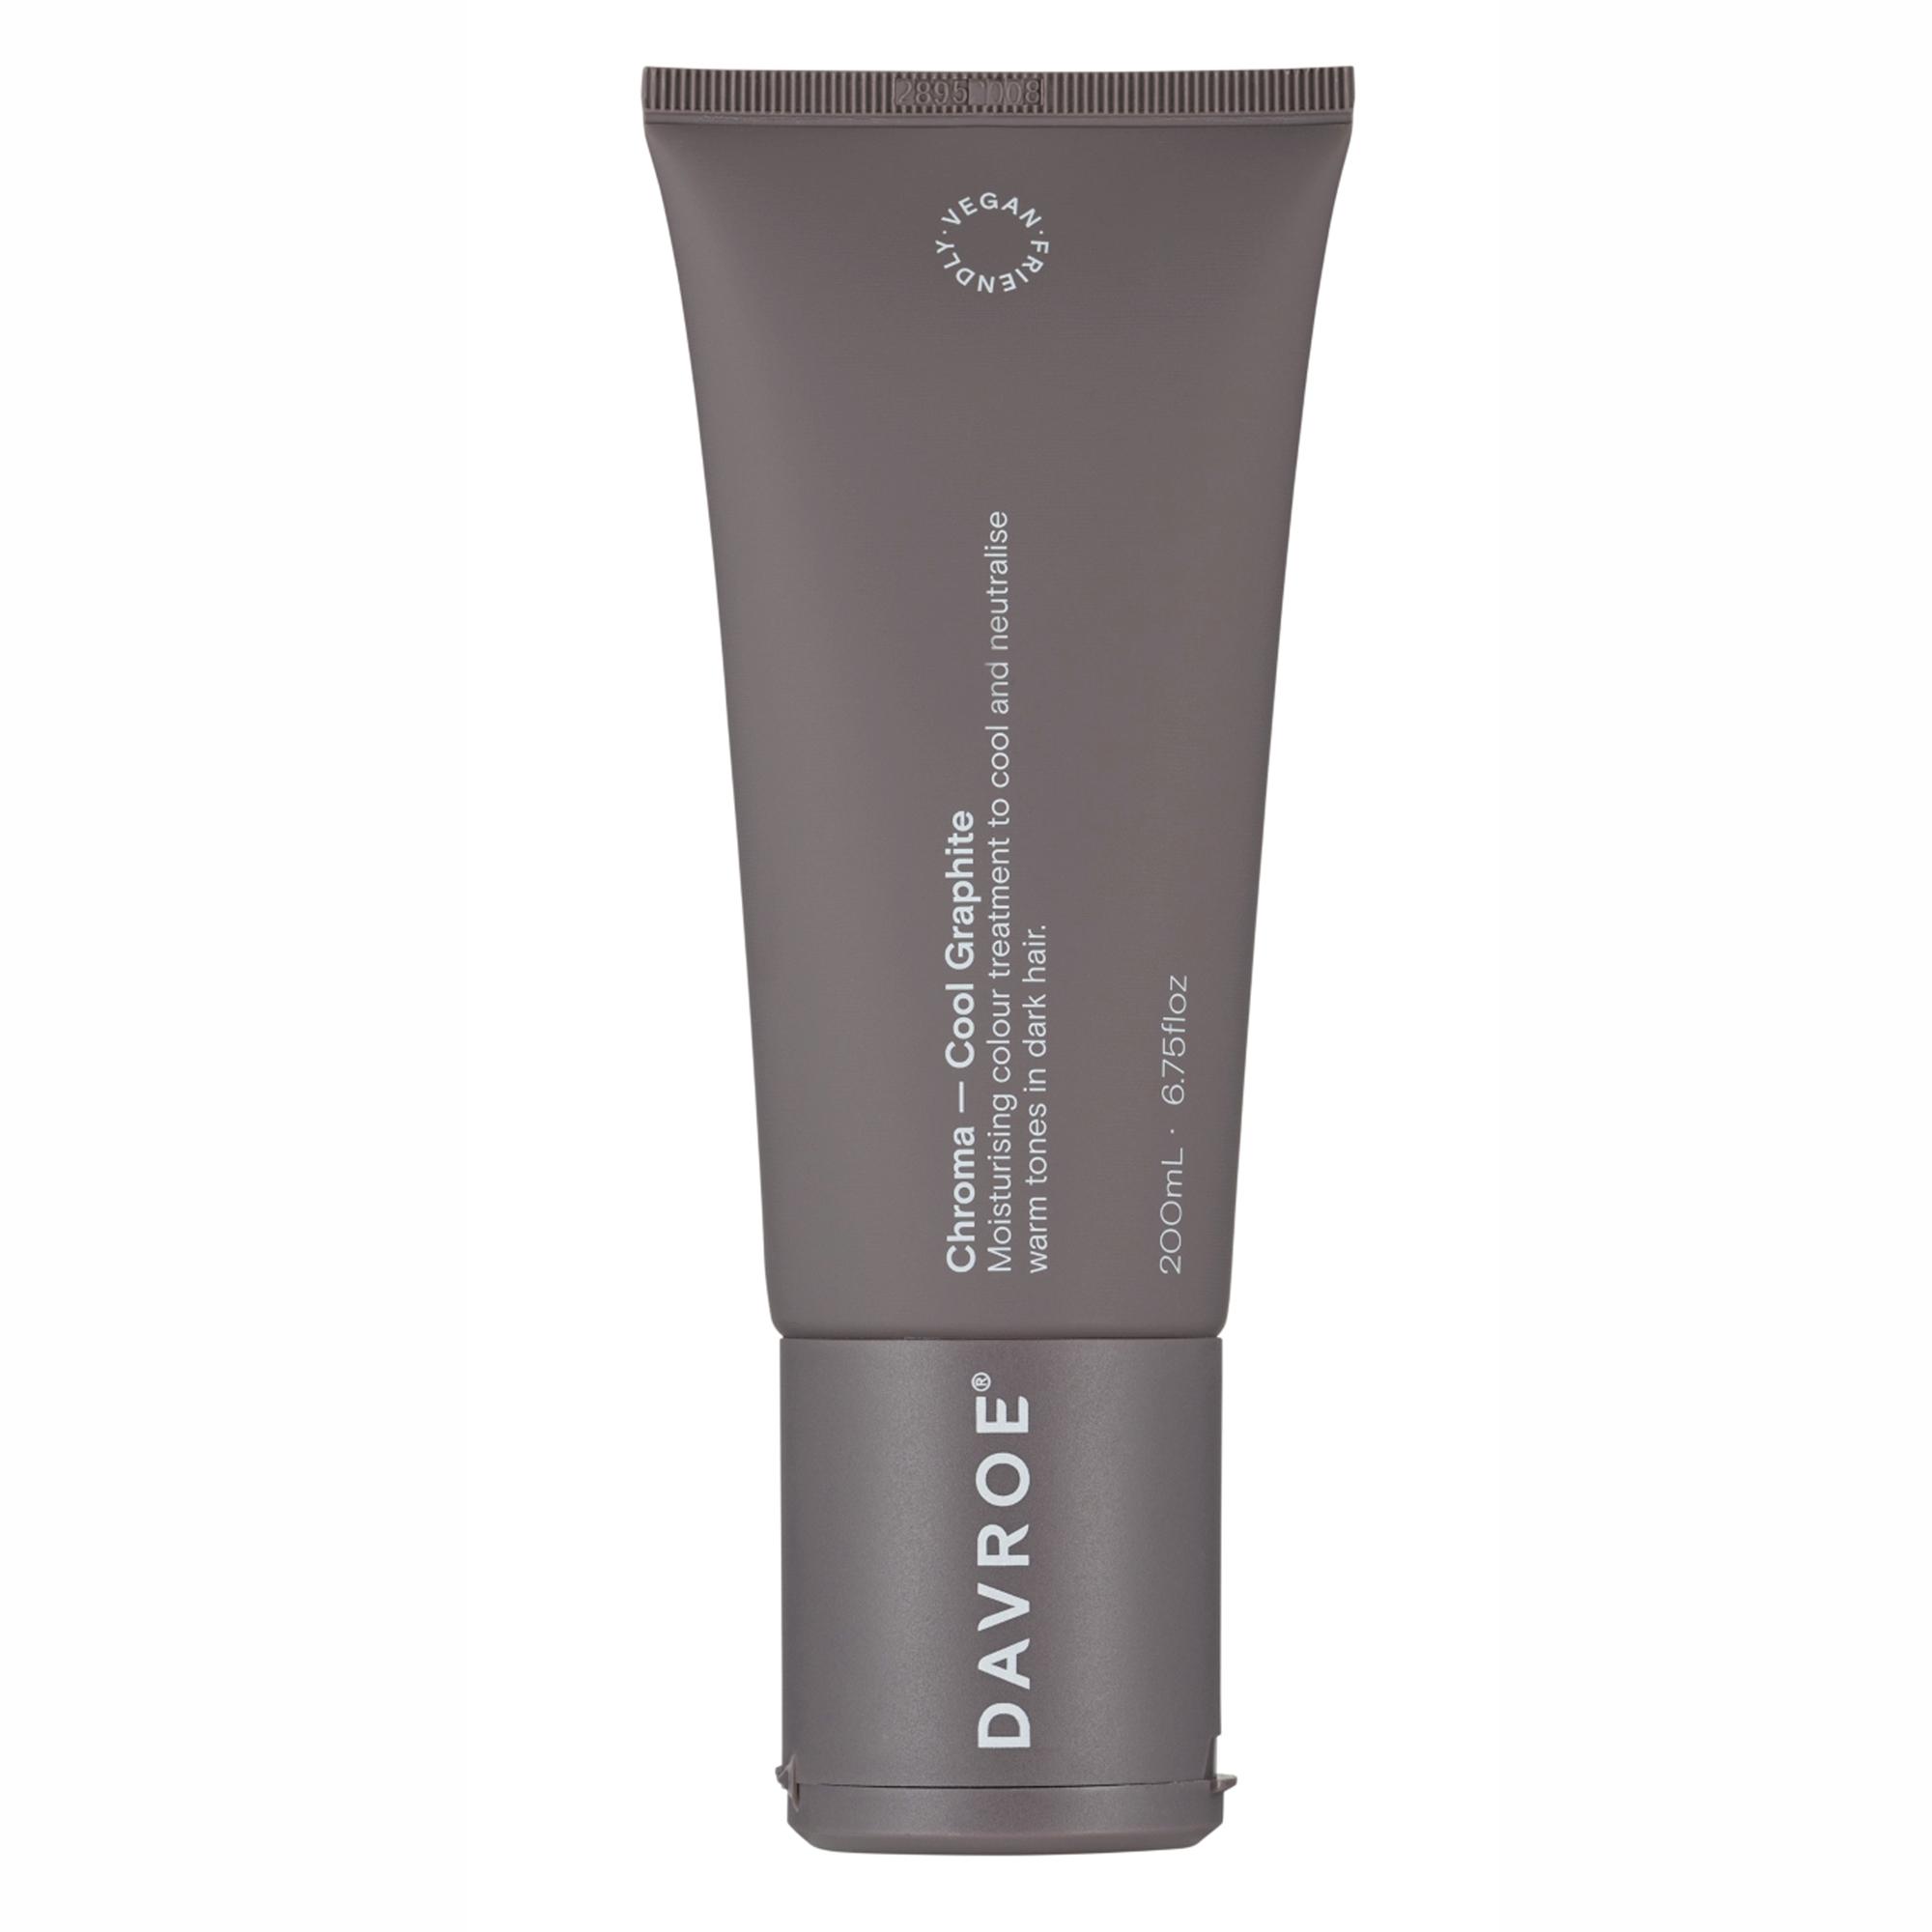 Davroe-Chroma-Cool-Graphite-200ml